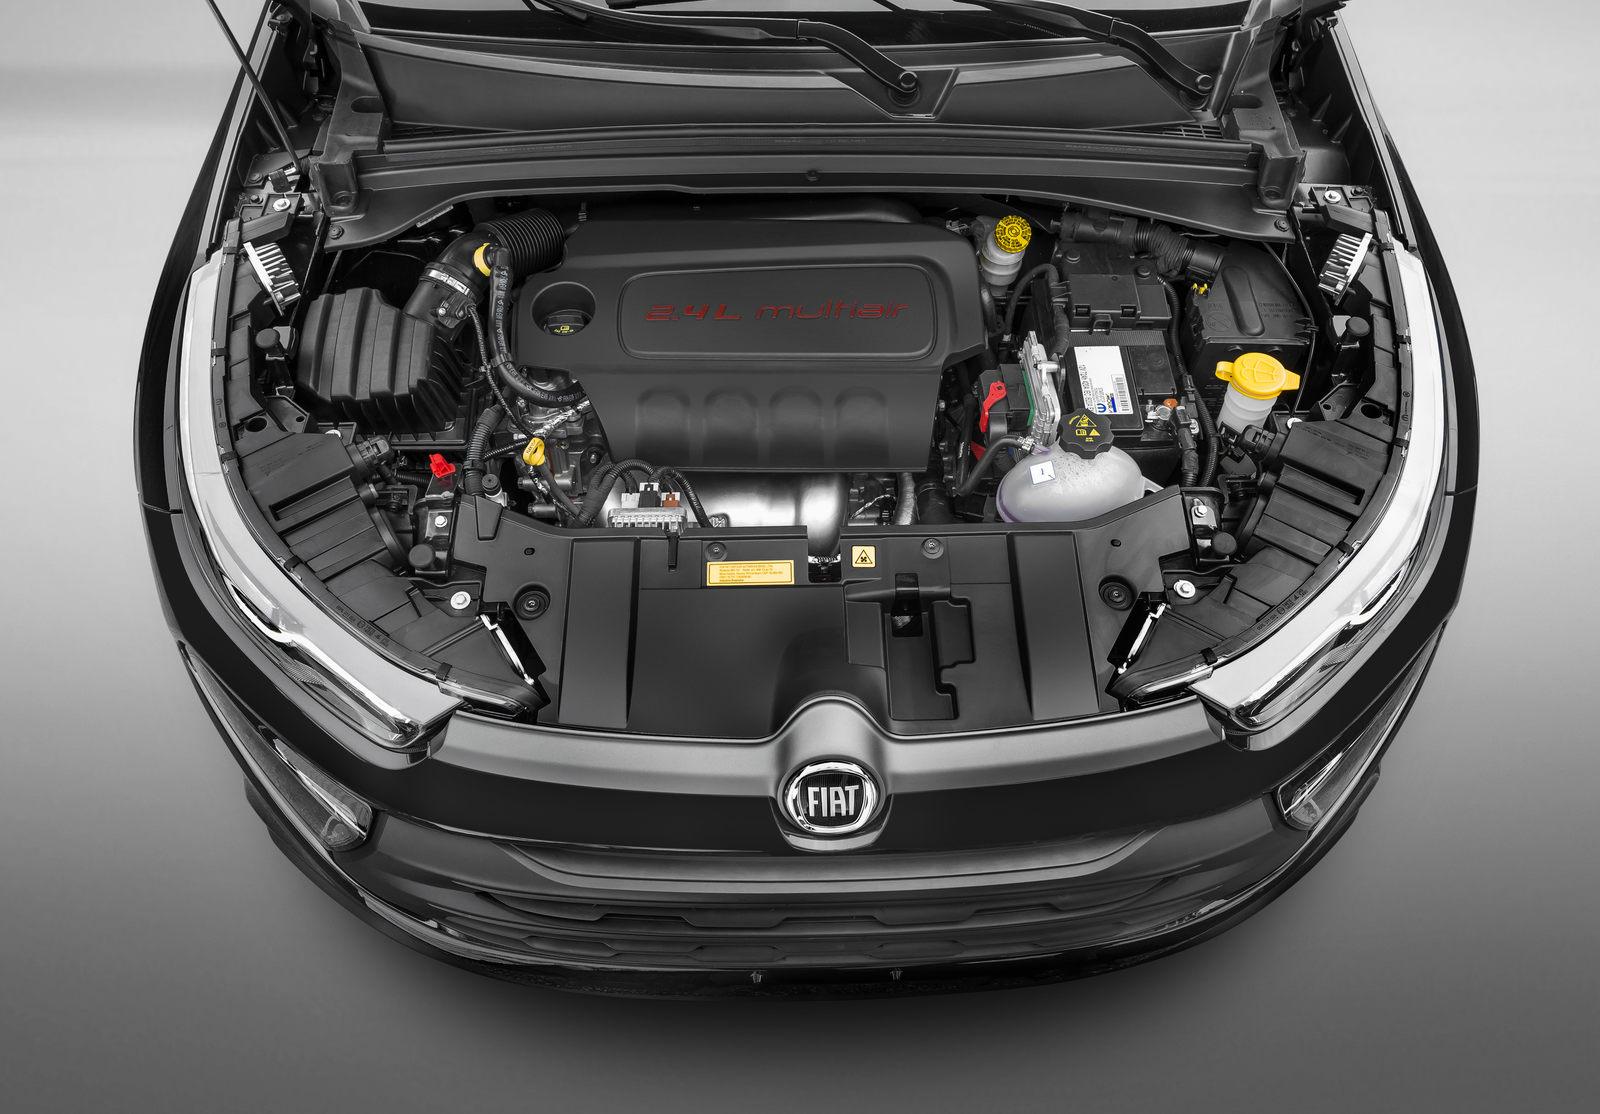 Carros de marcas distintas com o mesmo motor: Fiat Toro